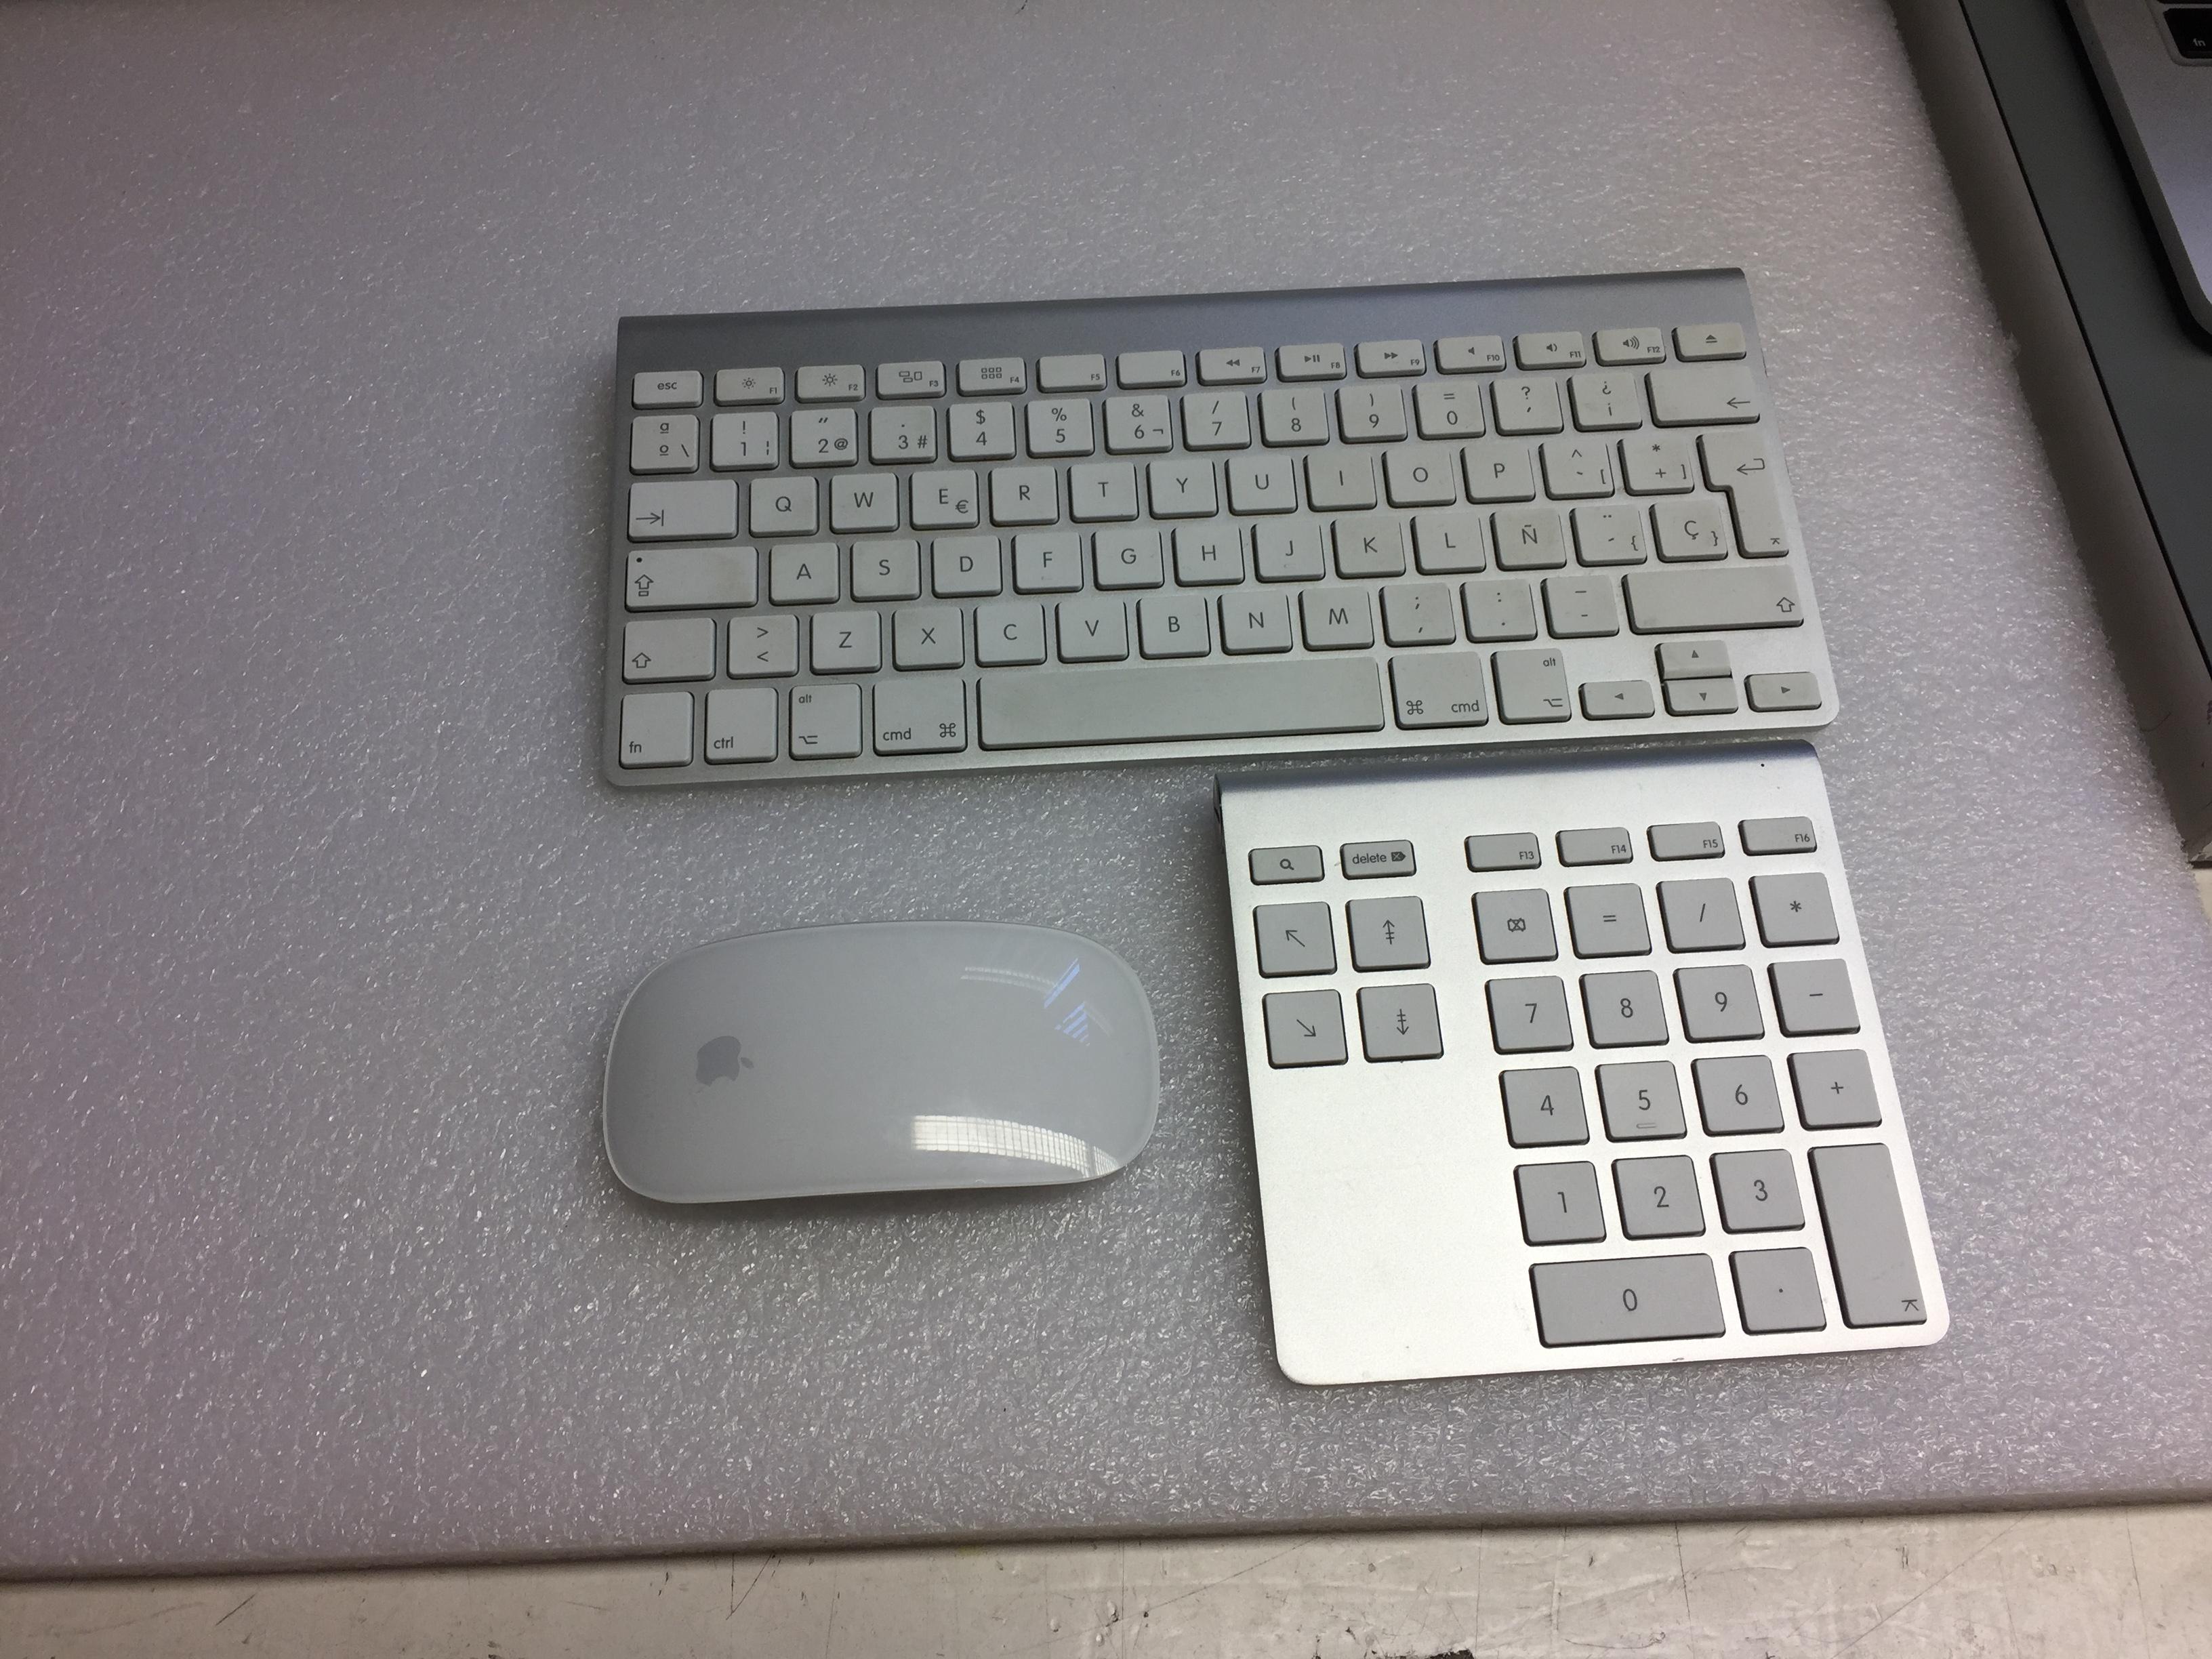 iMac 21.5-inch, Intel Core i5 1,4 GHz, 8 GB, 500 GB, imagen 5